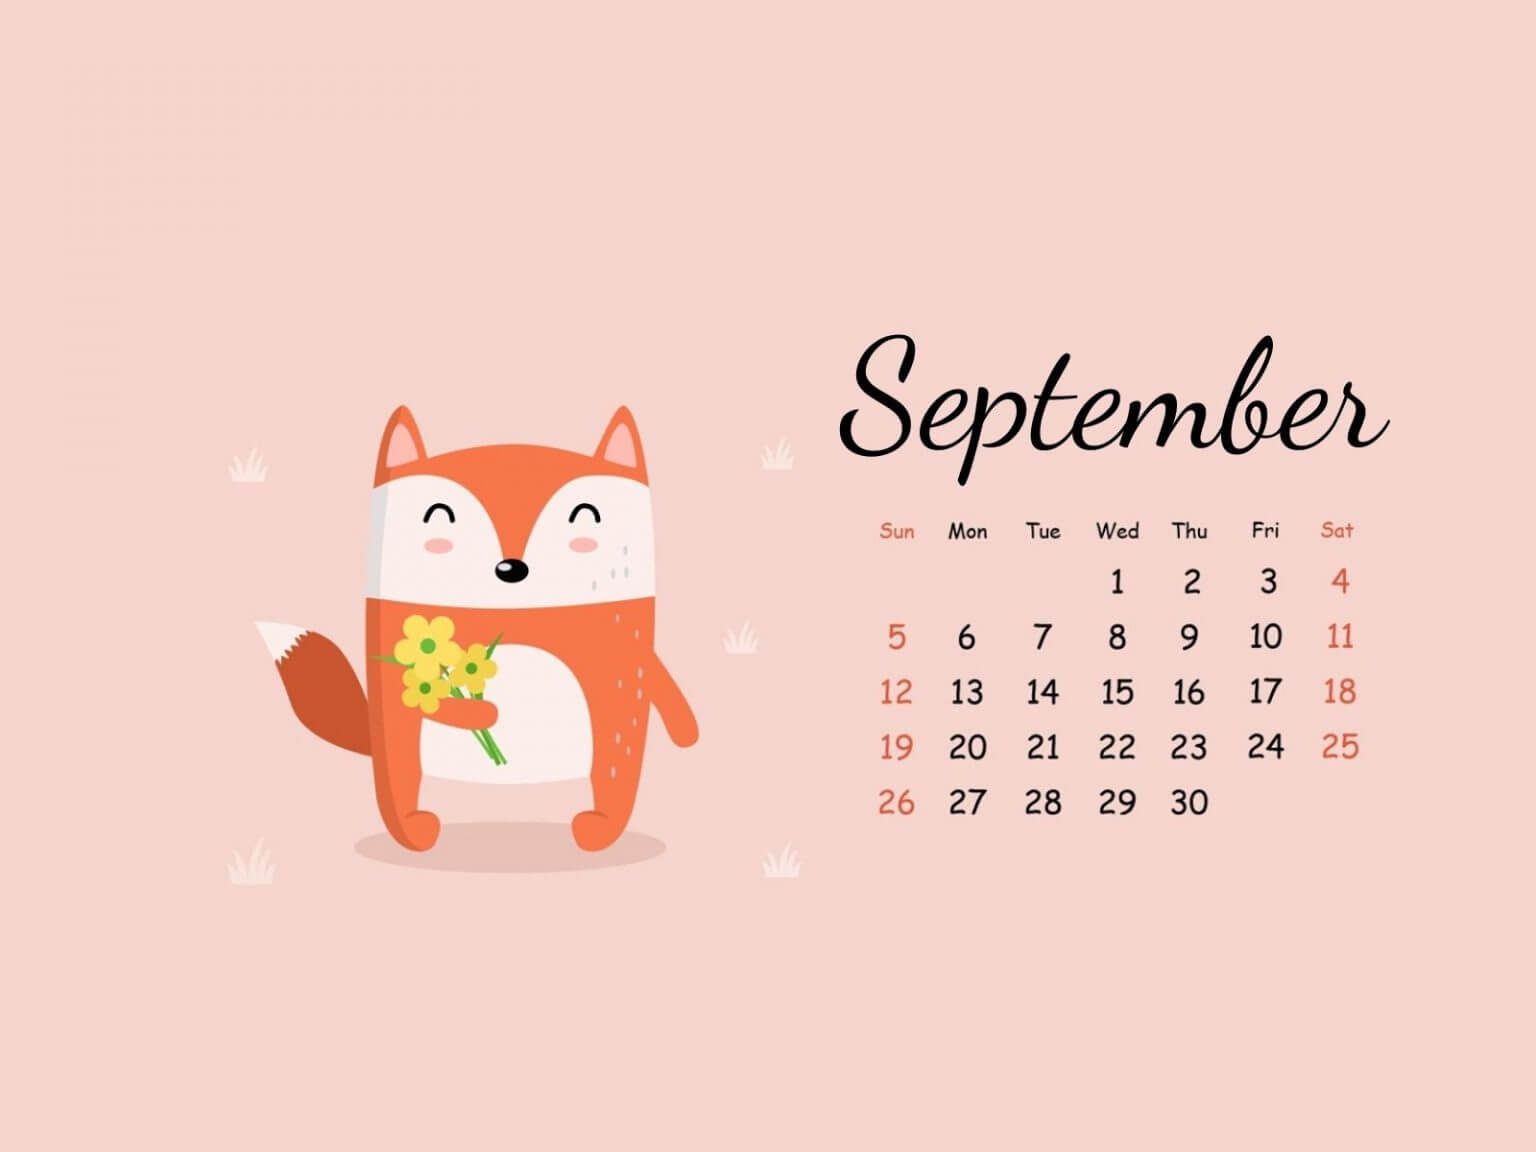 September 2021 Calendar Wallpaper